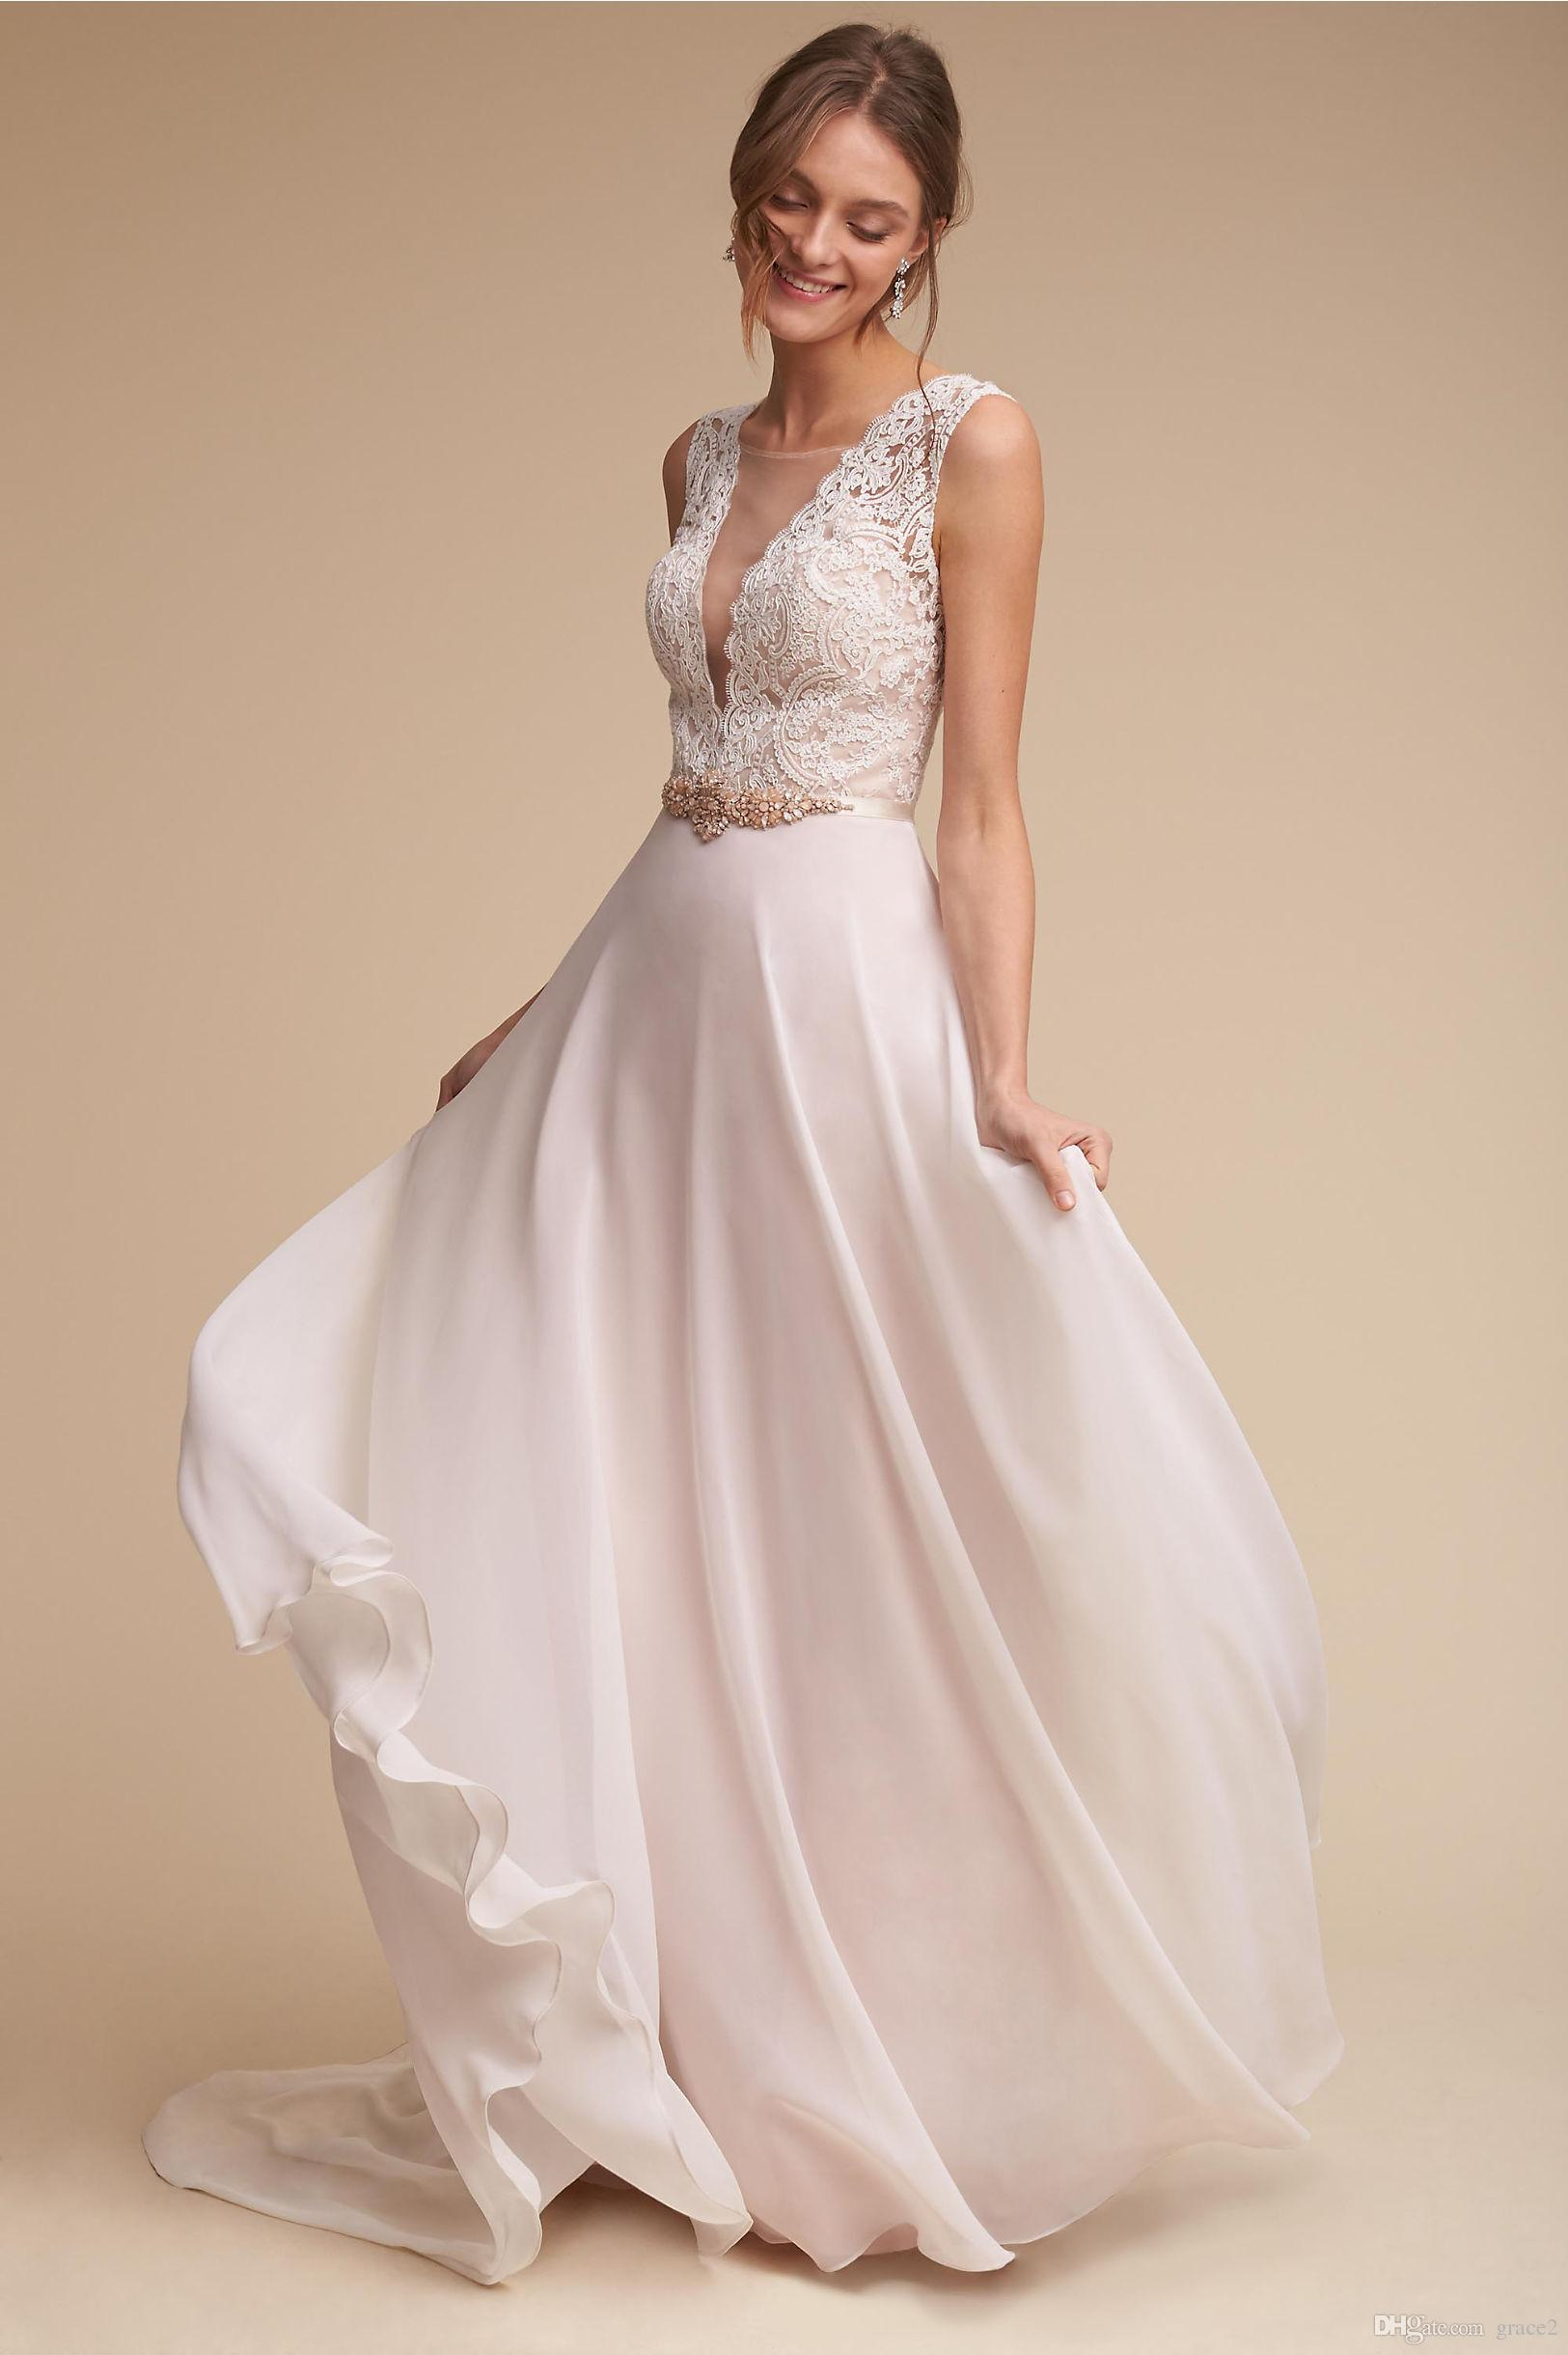 Discount Bohemian Wedding Dresses 2017 Bhldn Ivory Lace & Chiffon